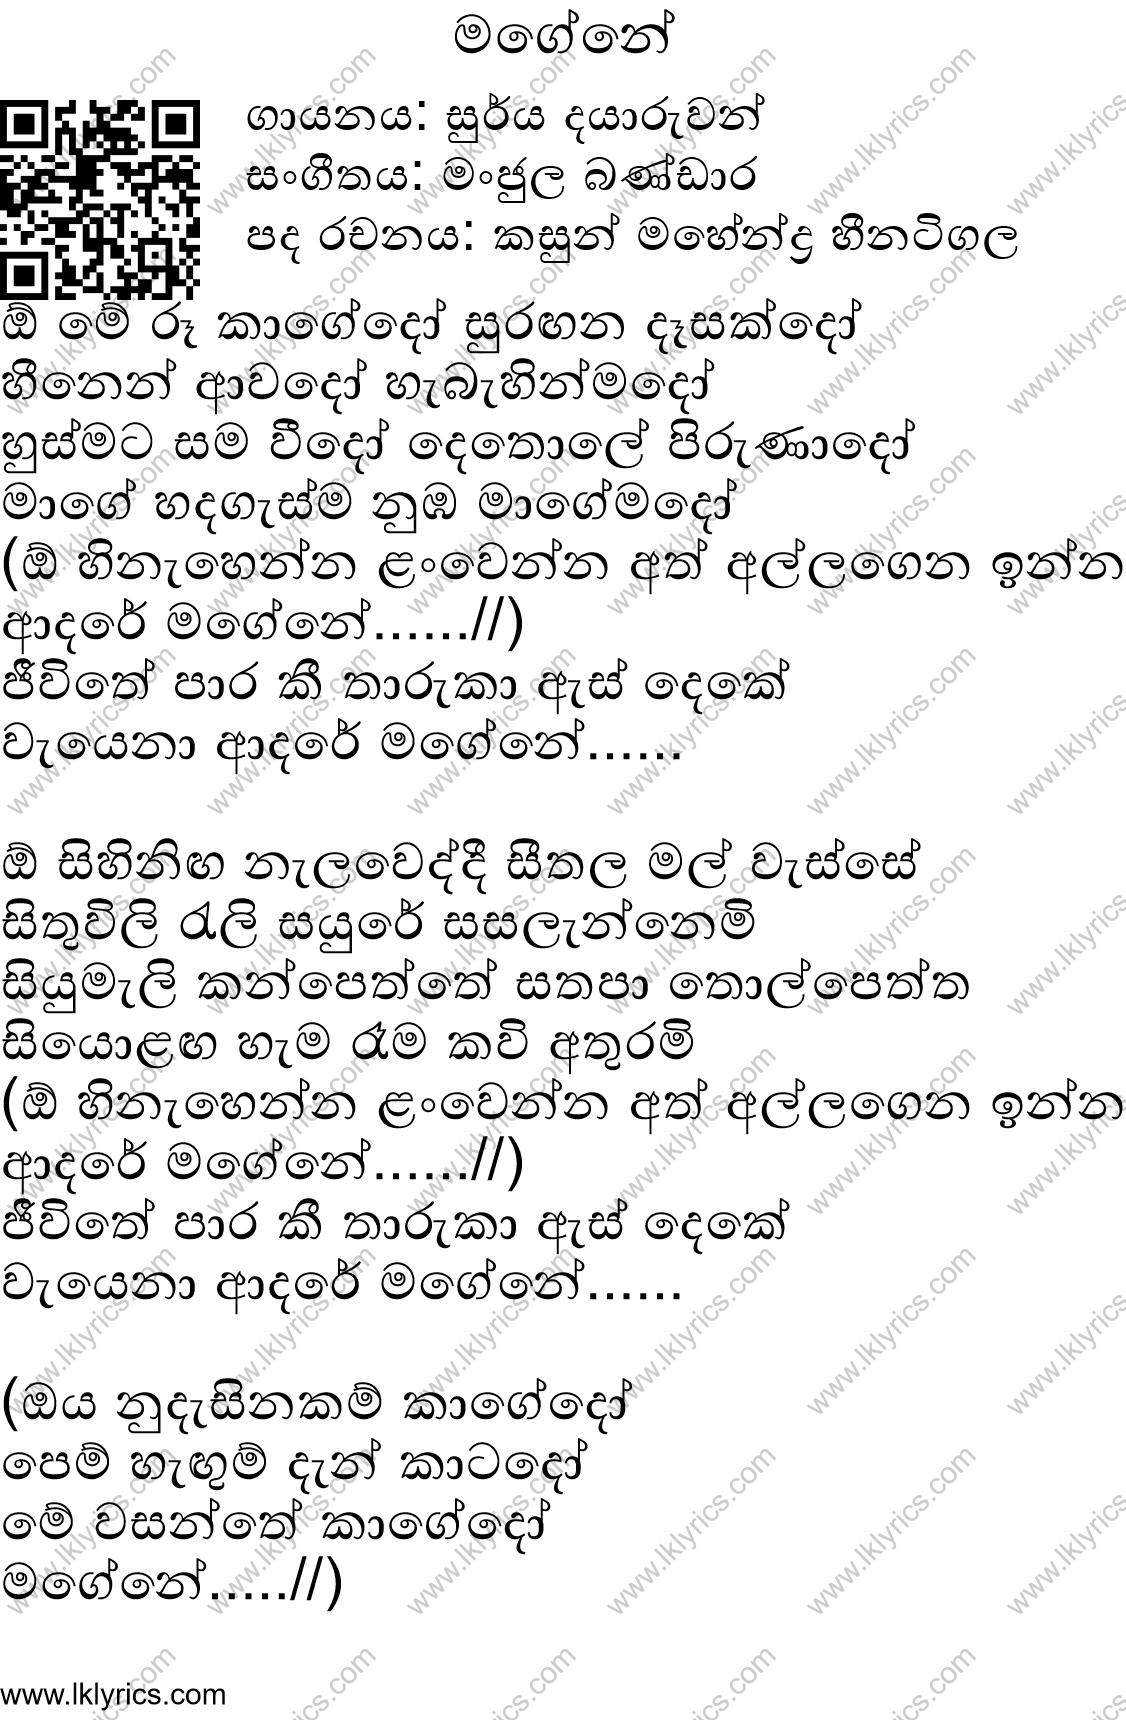 Magene Lyrics - LK Lyrics